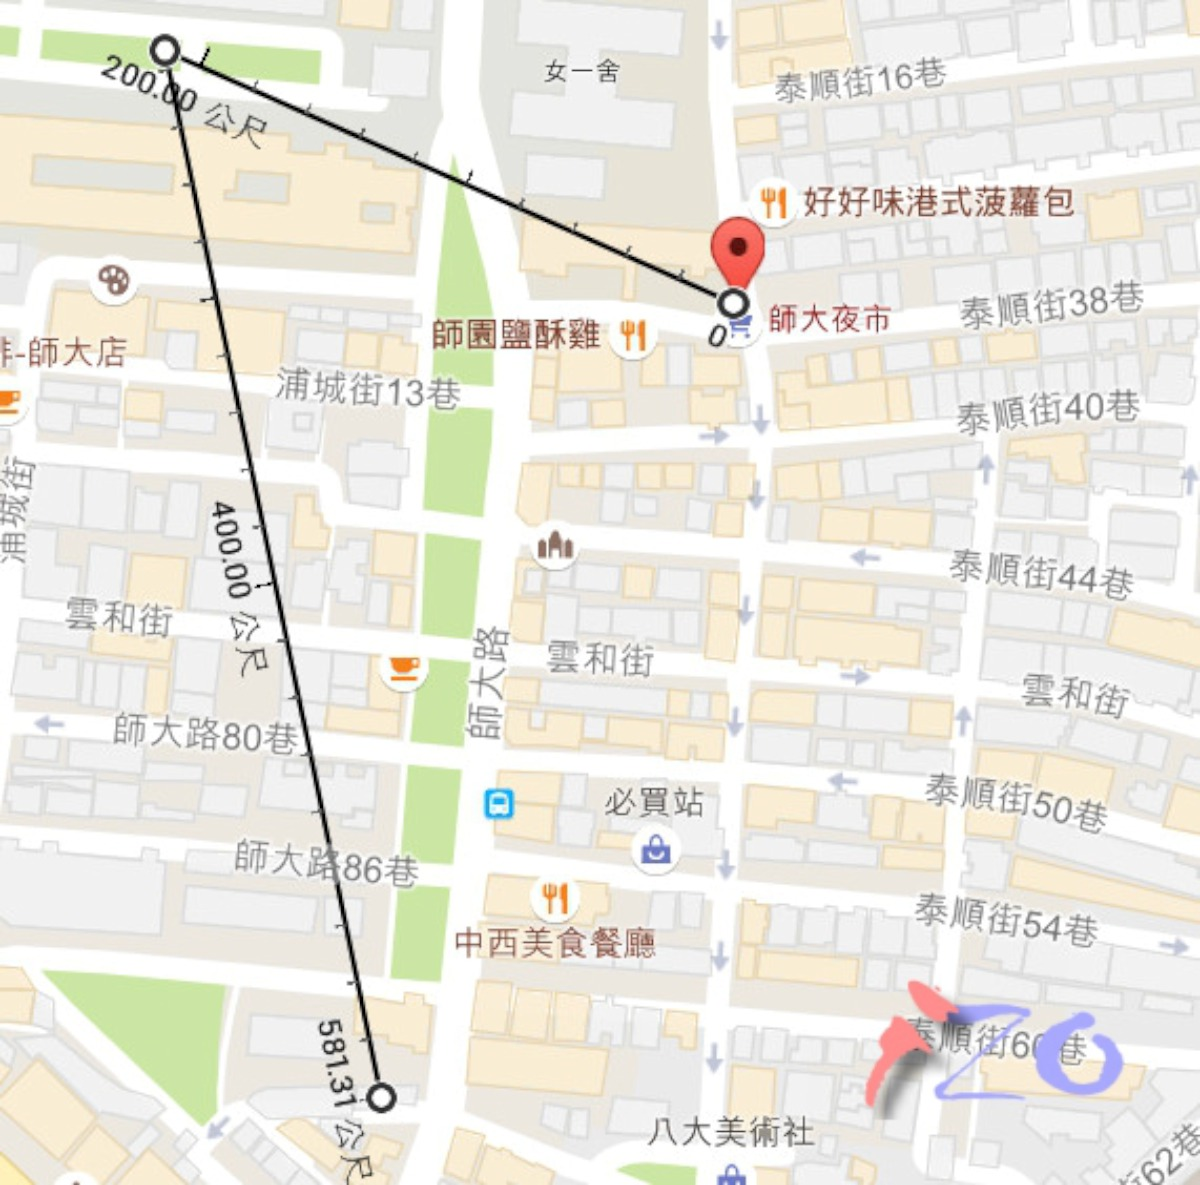 google-map-line-02